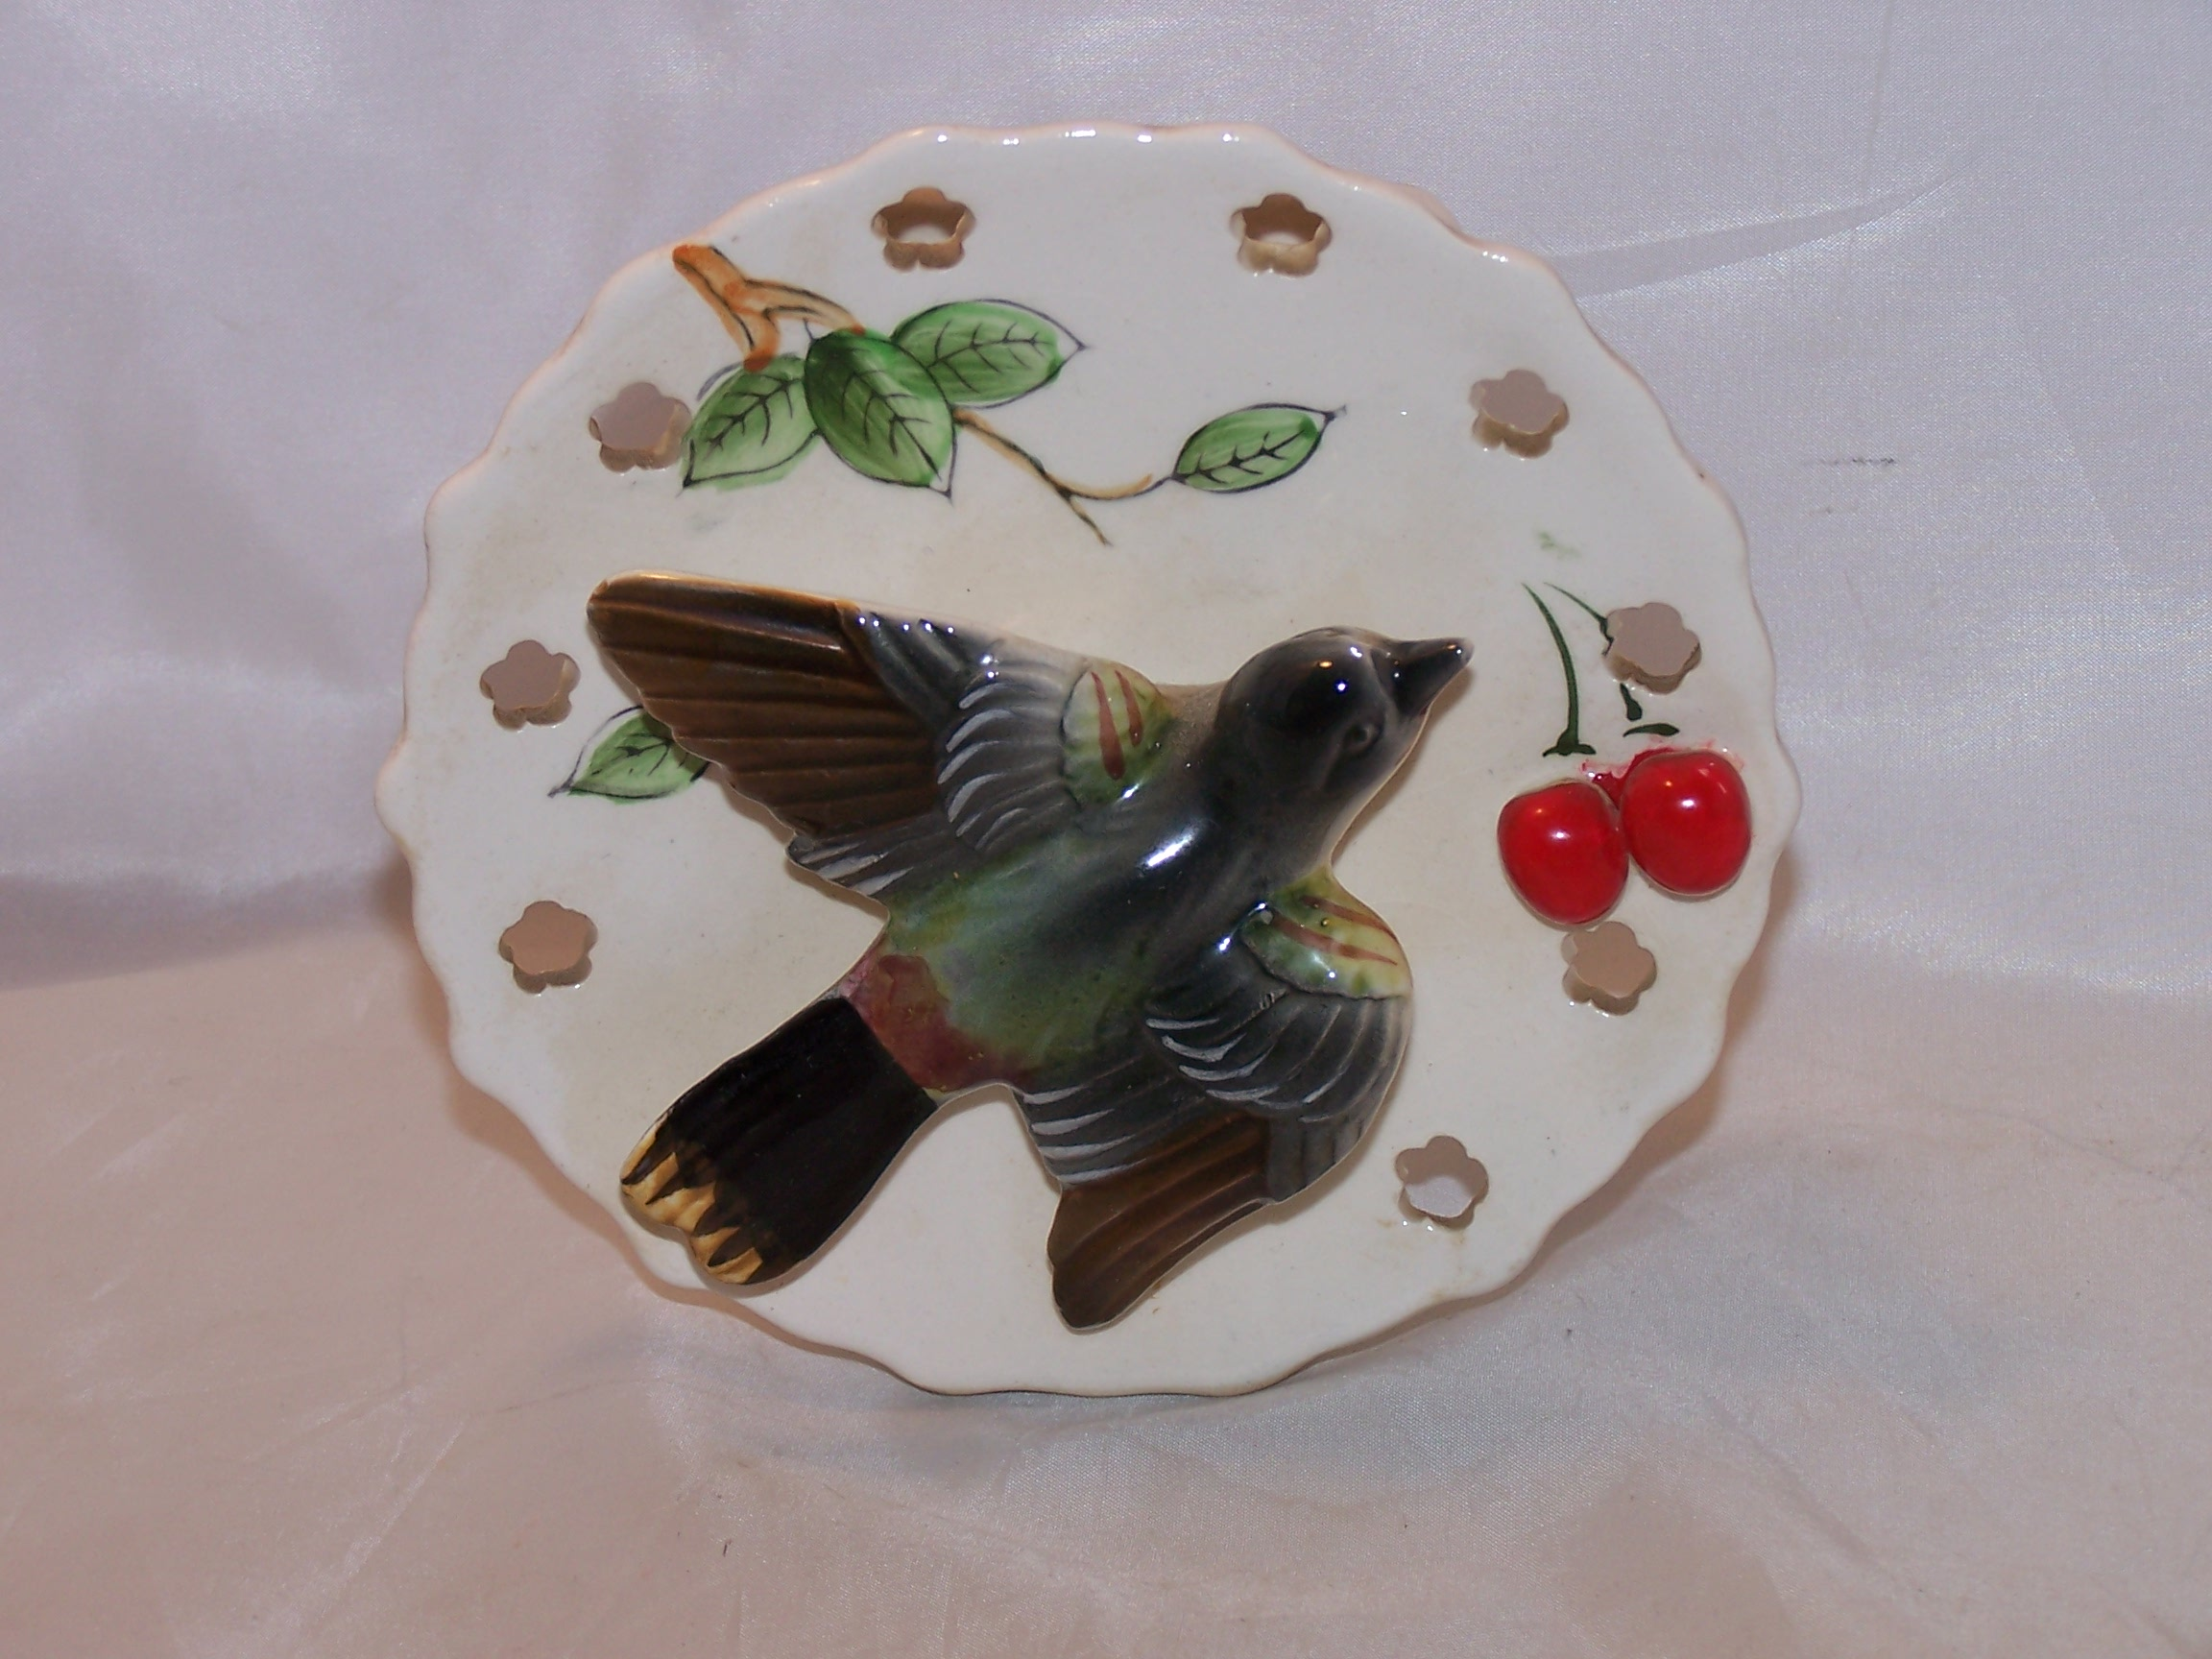 Image 6 of Lipper and Mann Wall Pocket Vase w Bird, Cherries